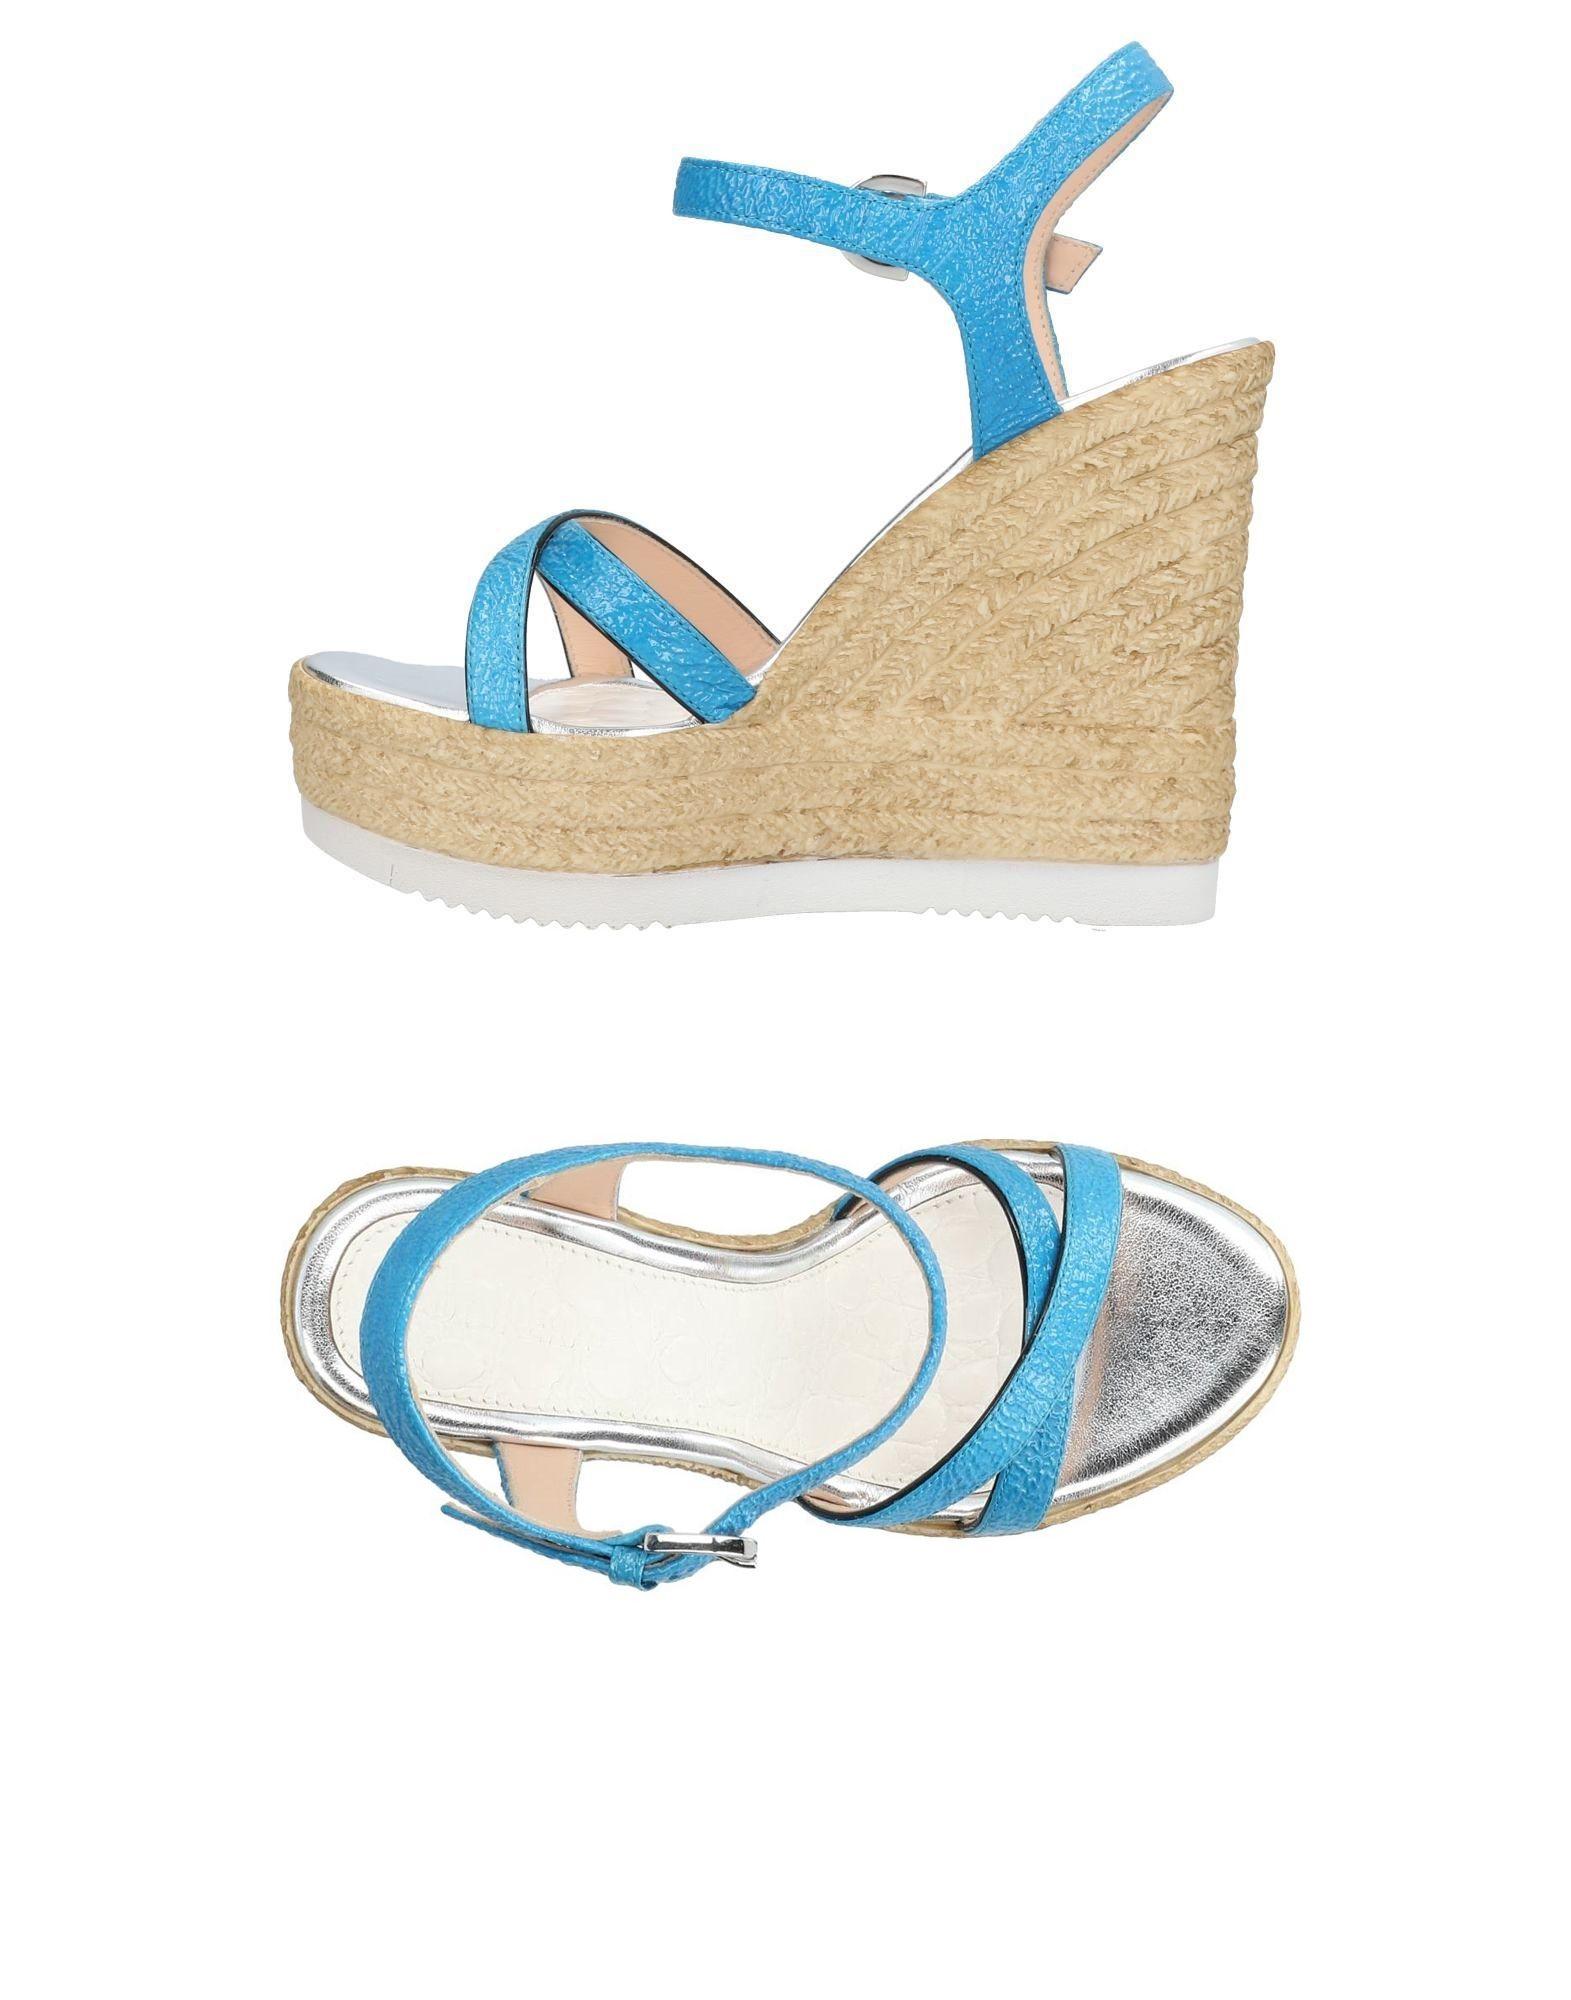 Dibrera By Paolo Zanoli Sandalen Damen 11422244VB  11422244VB Damen Gute Qualität beliebte Schuhe c8d540